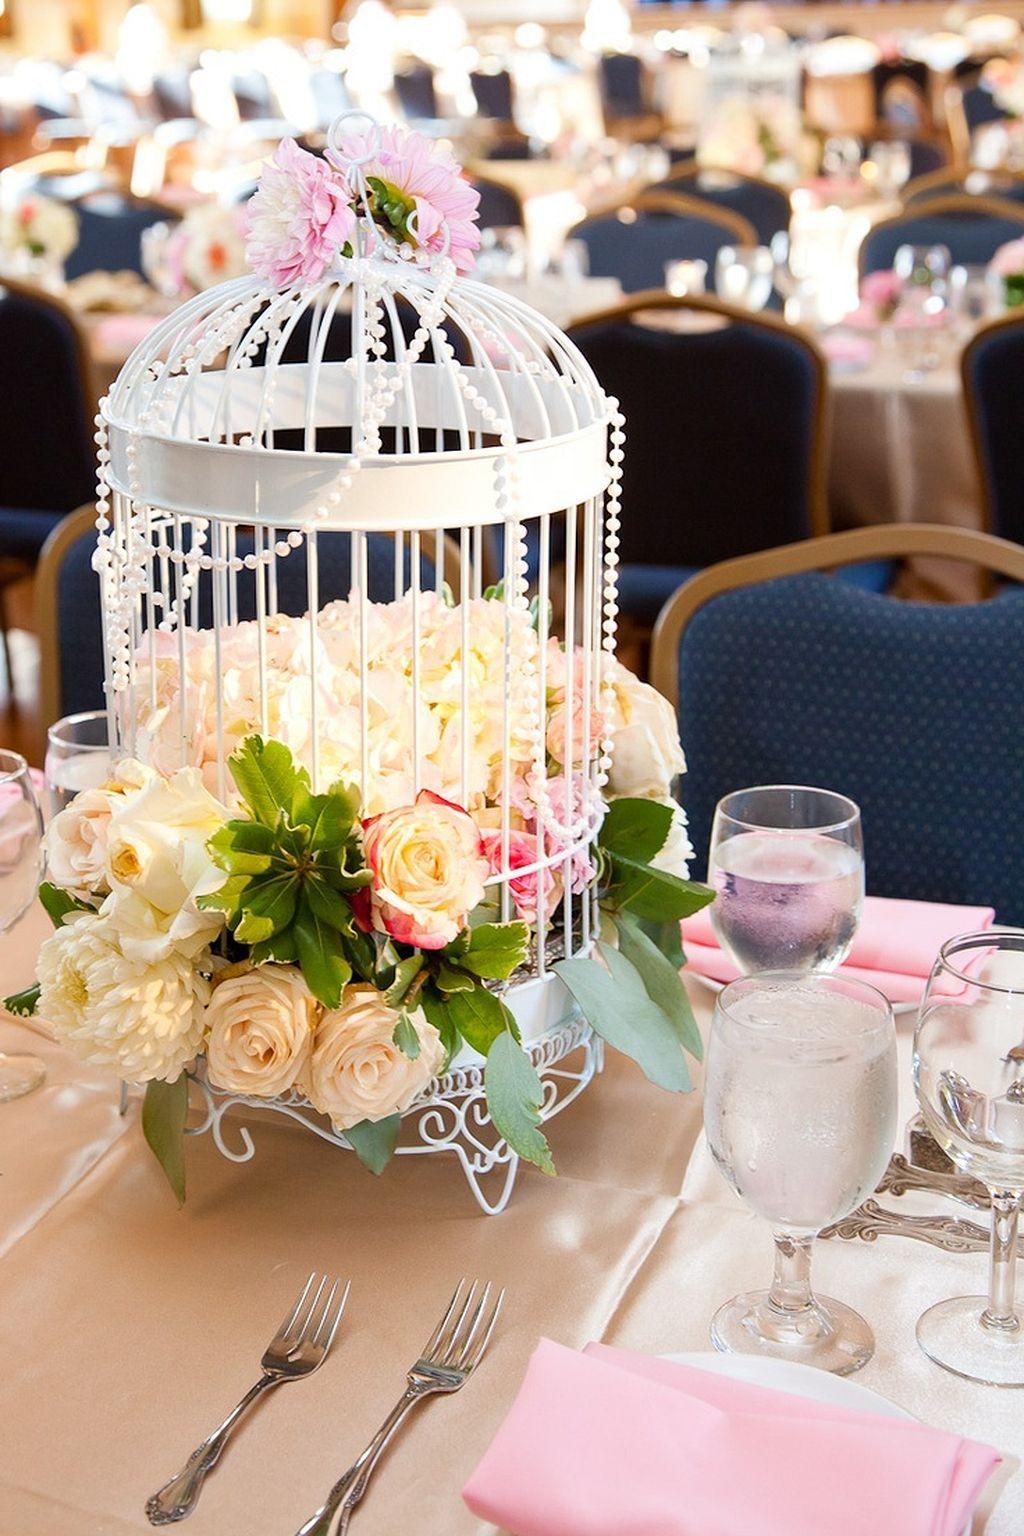 30 Birdcage Centerpiece For Rustic Wedding Ideas